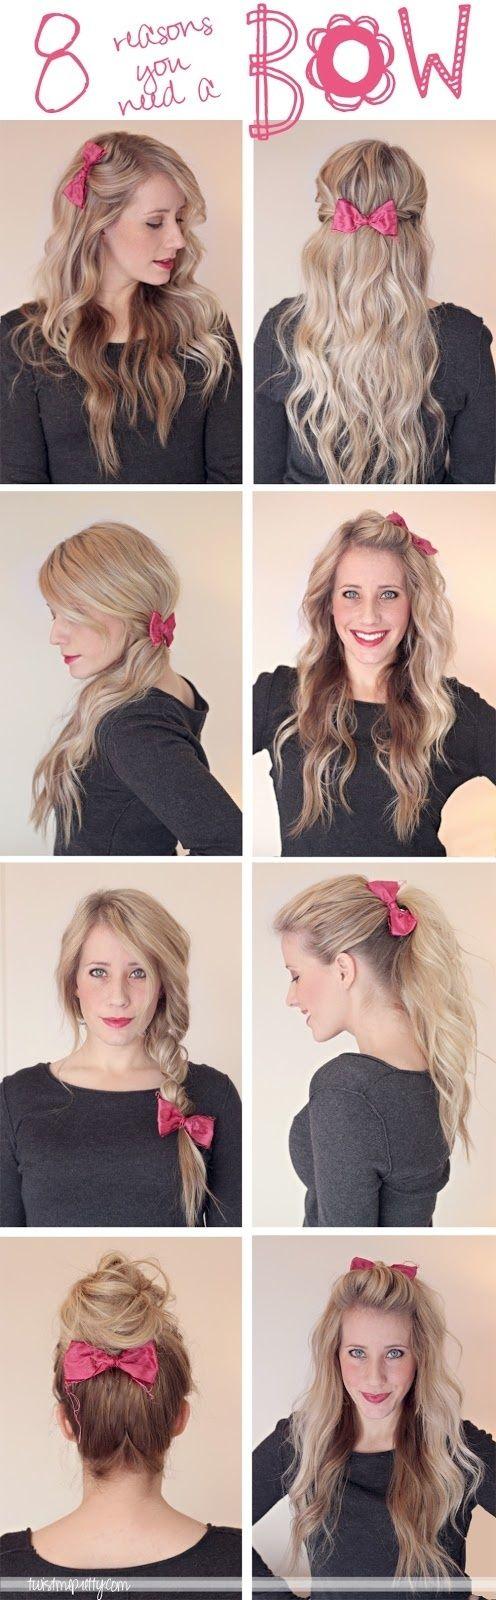 best images about hair u makeup u beauty on pinterest pore